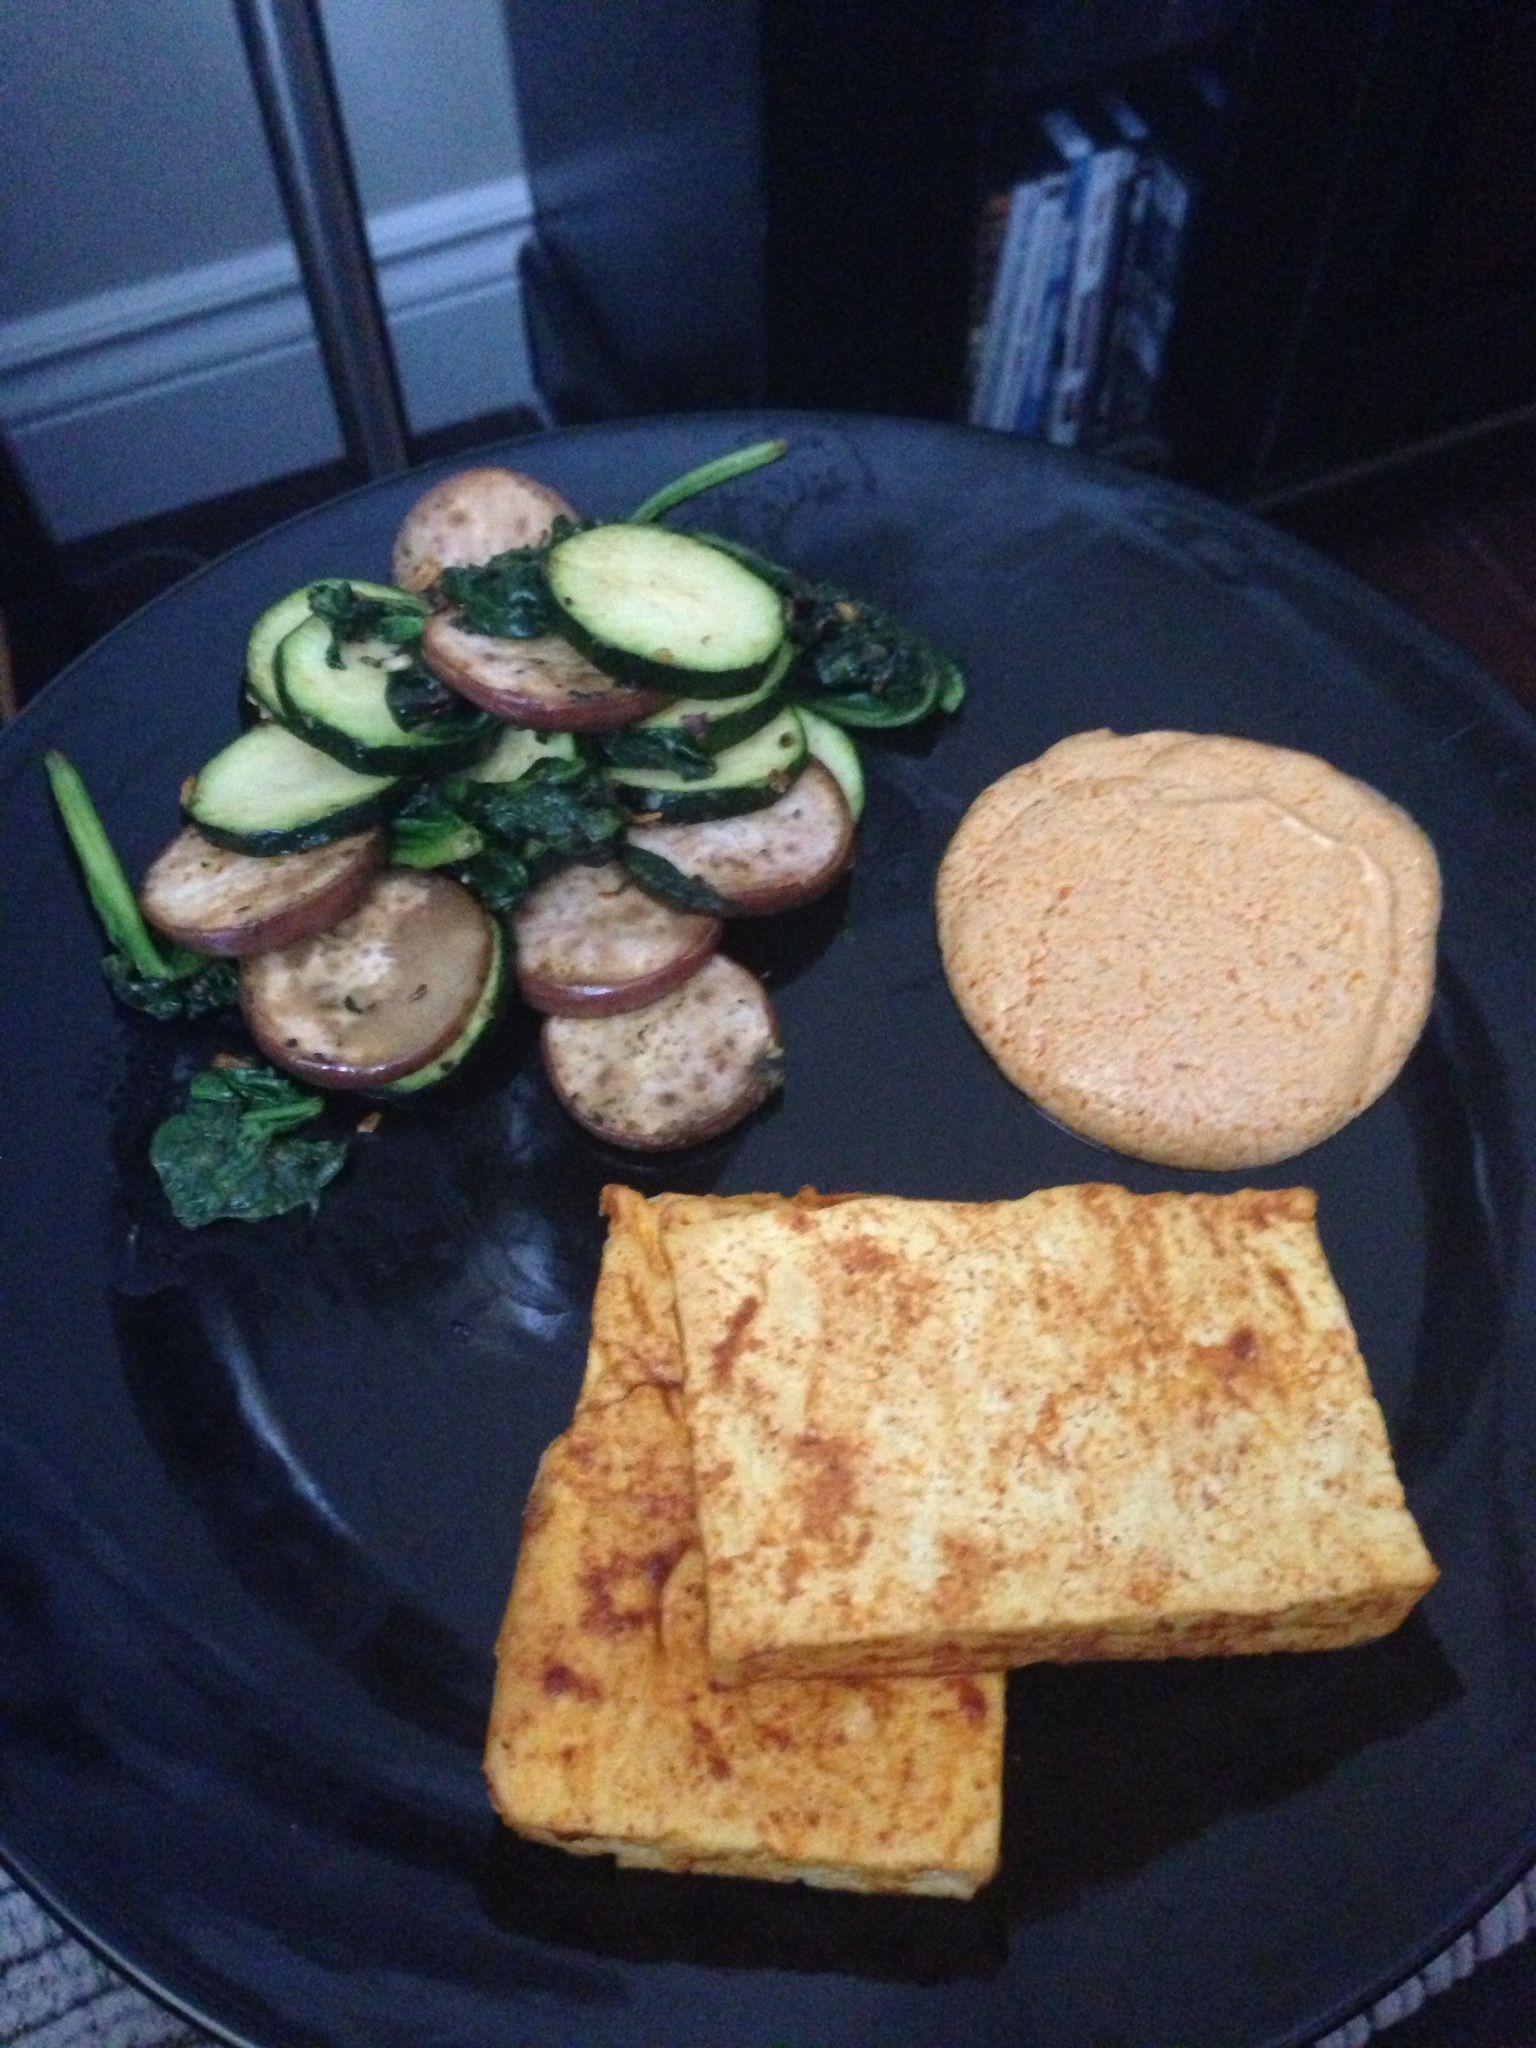 Grilled tandoori tofu  http://mobile.eatingwell.com/recipes/tandoori_tofu.html